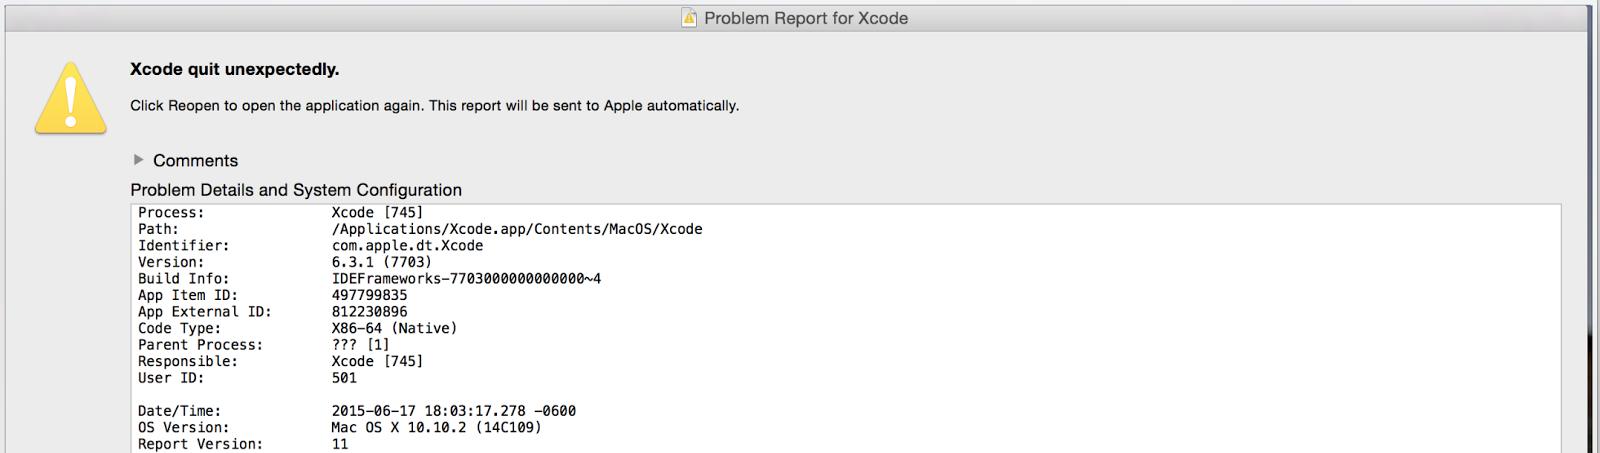 XCode Crash During Upload Causes Issue With TestFlight | inCaffeine